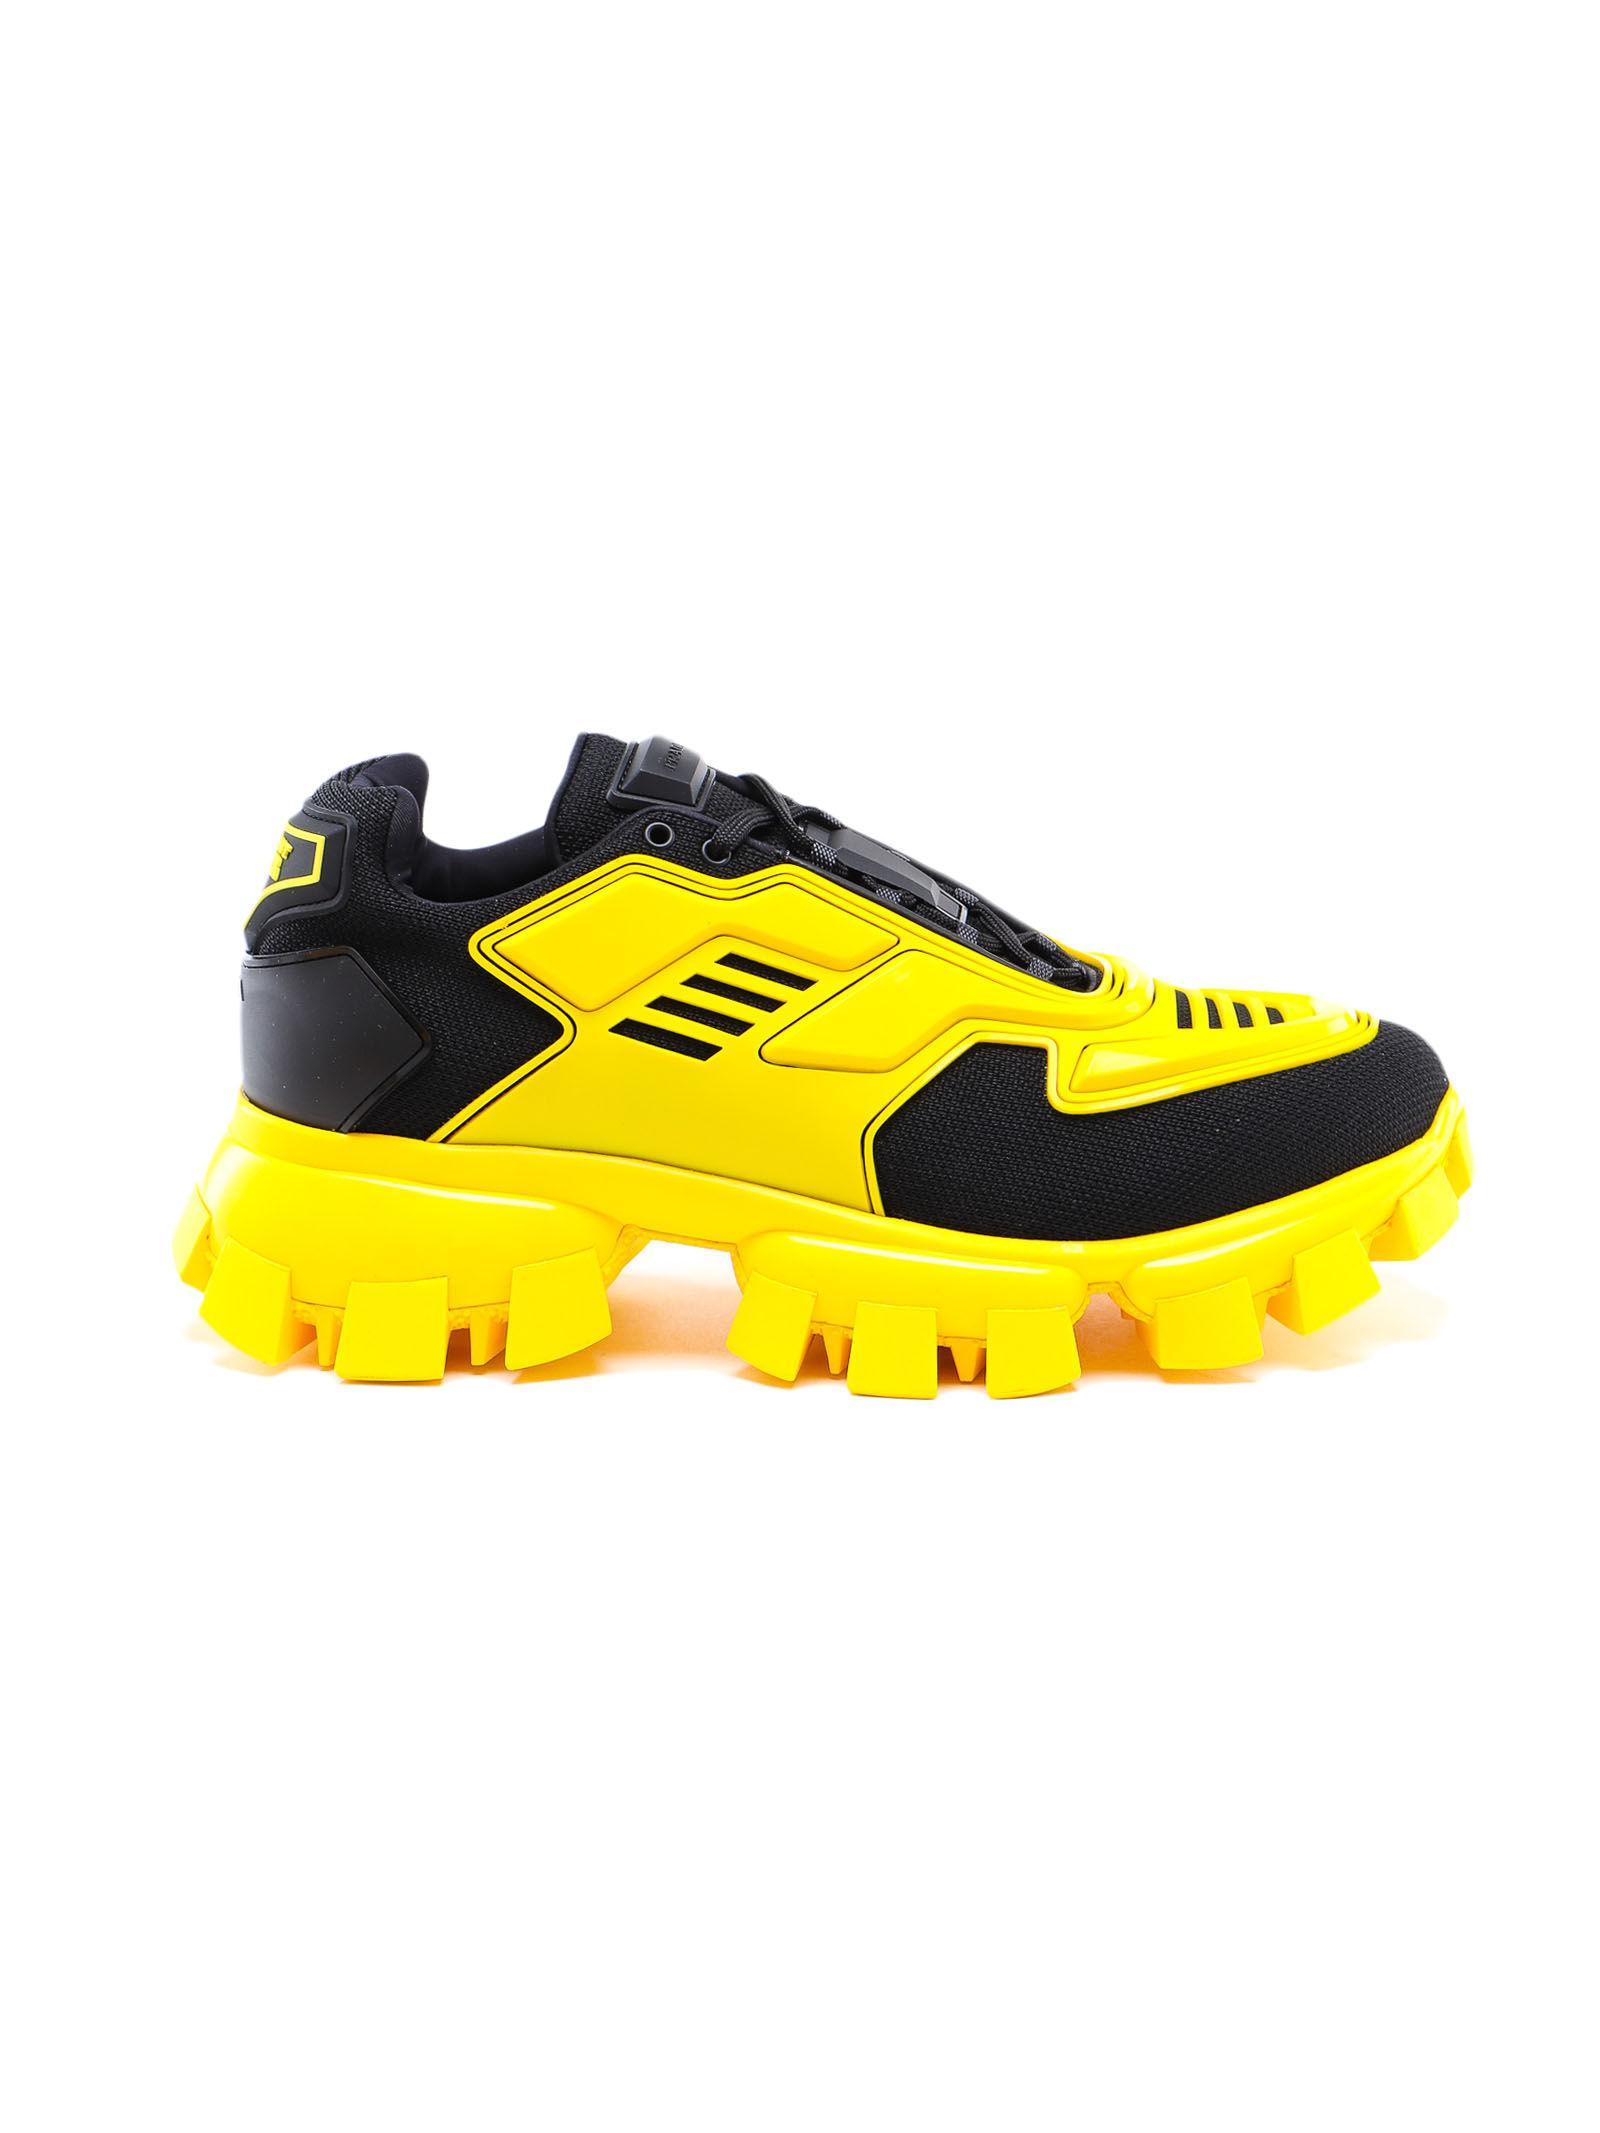 Prada Rubber Cloudbust Thunder Sneakers